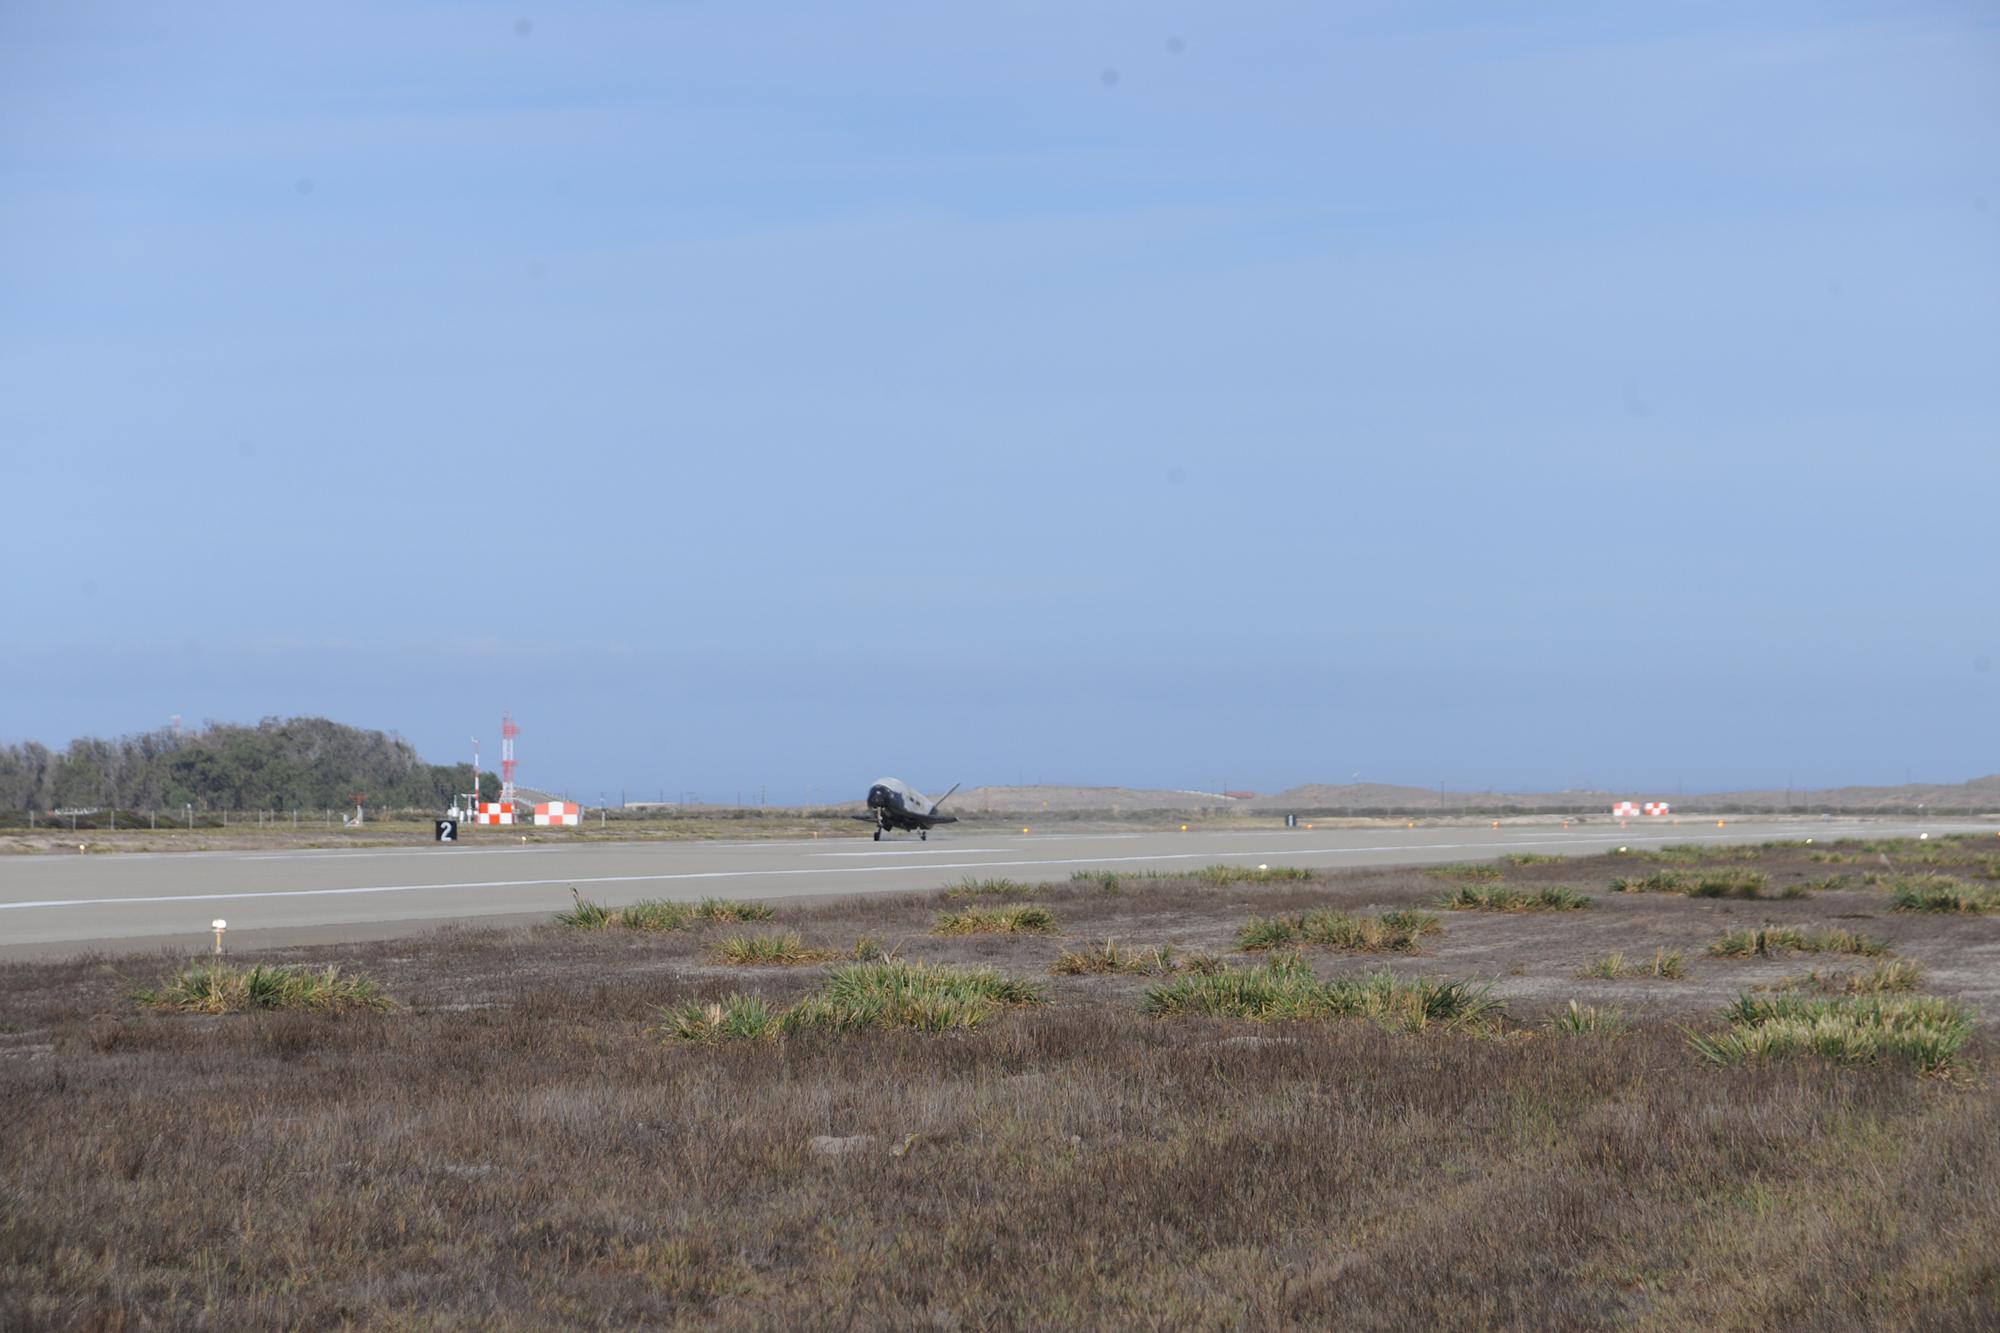 X-37B Space Plane Makes 3rd Landing